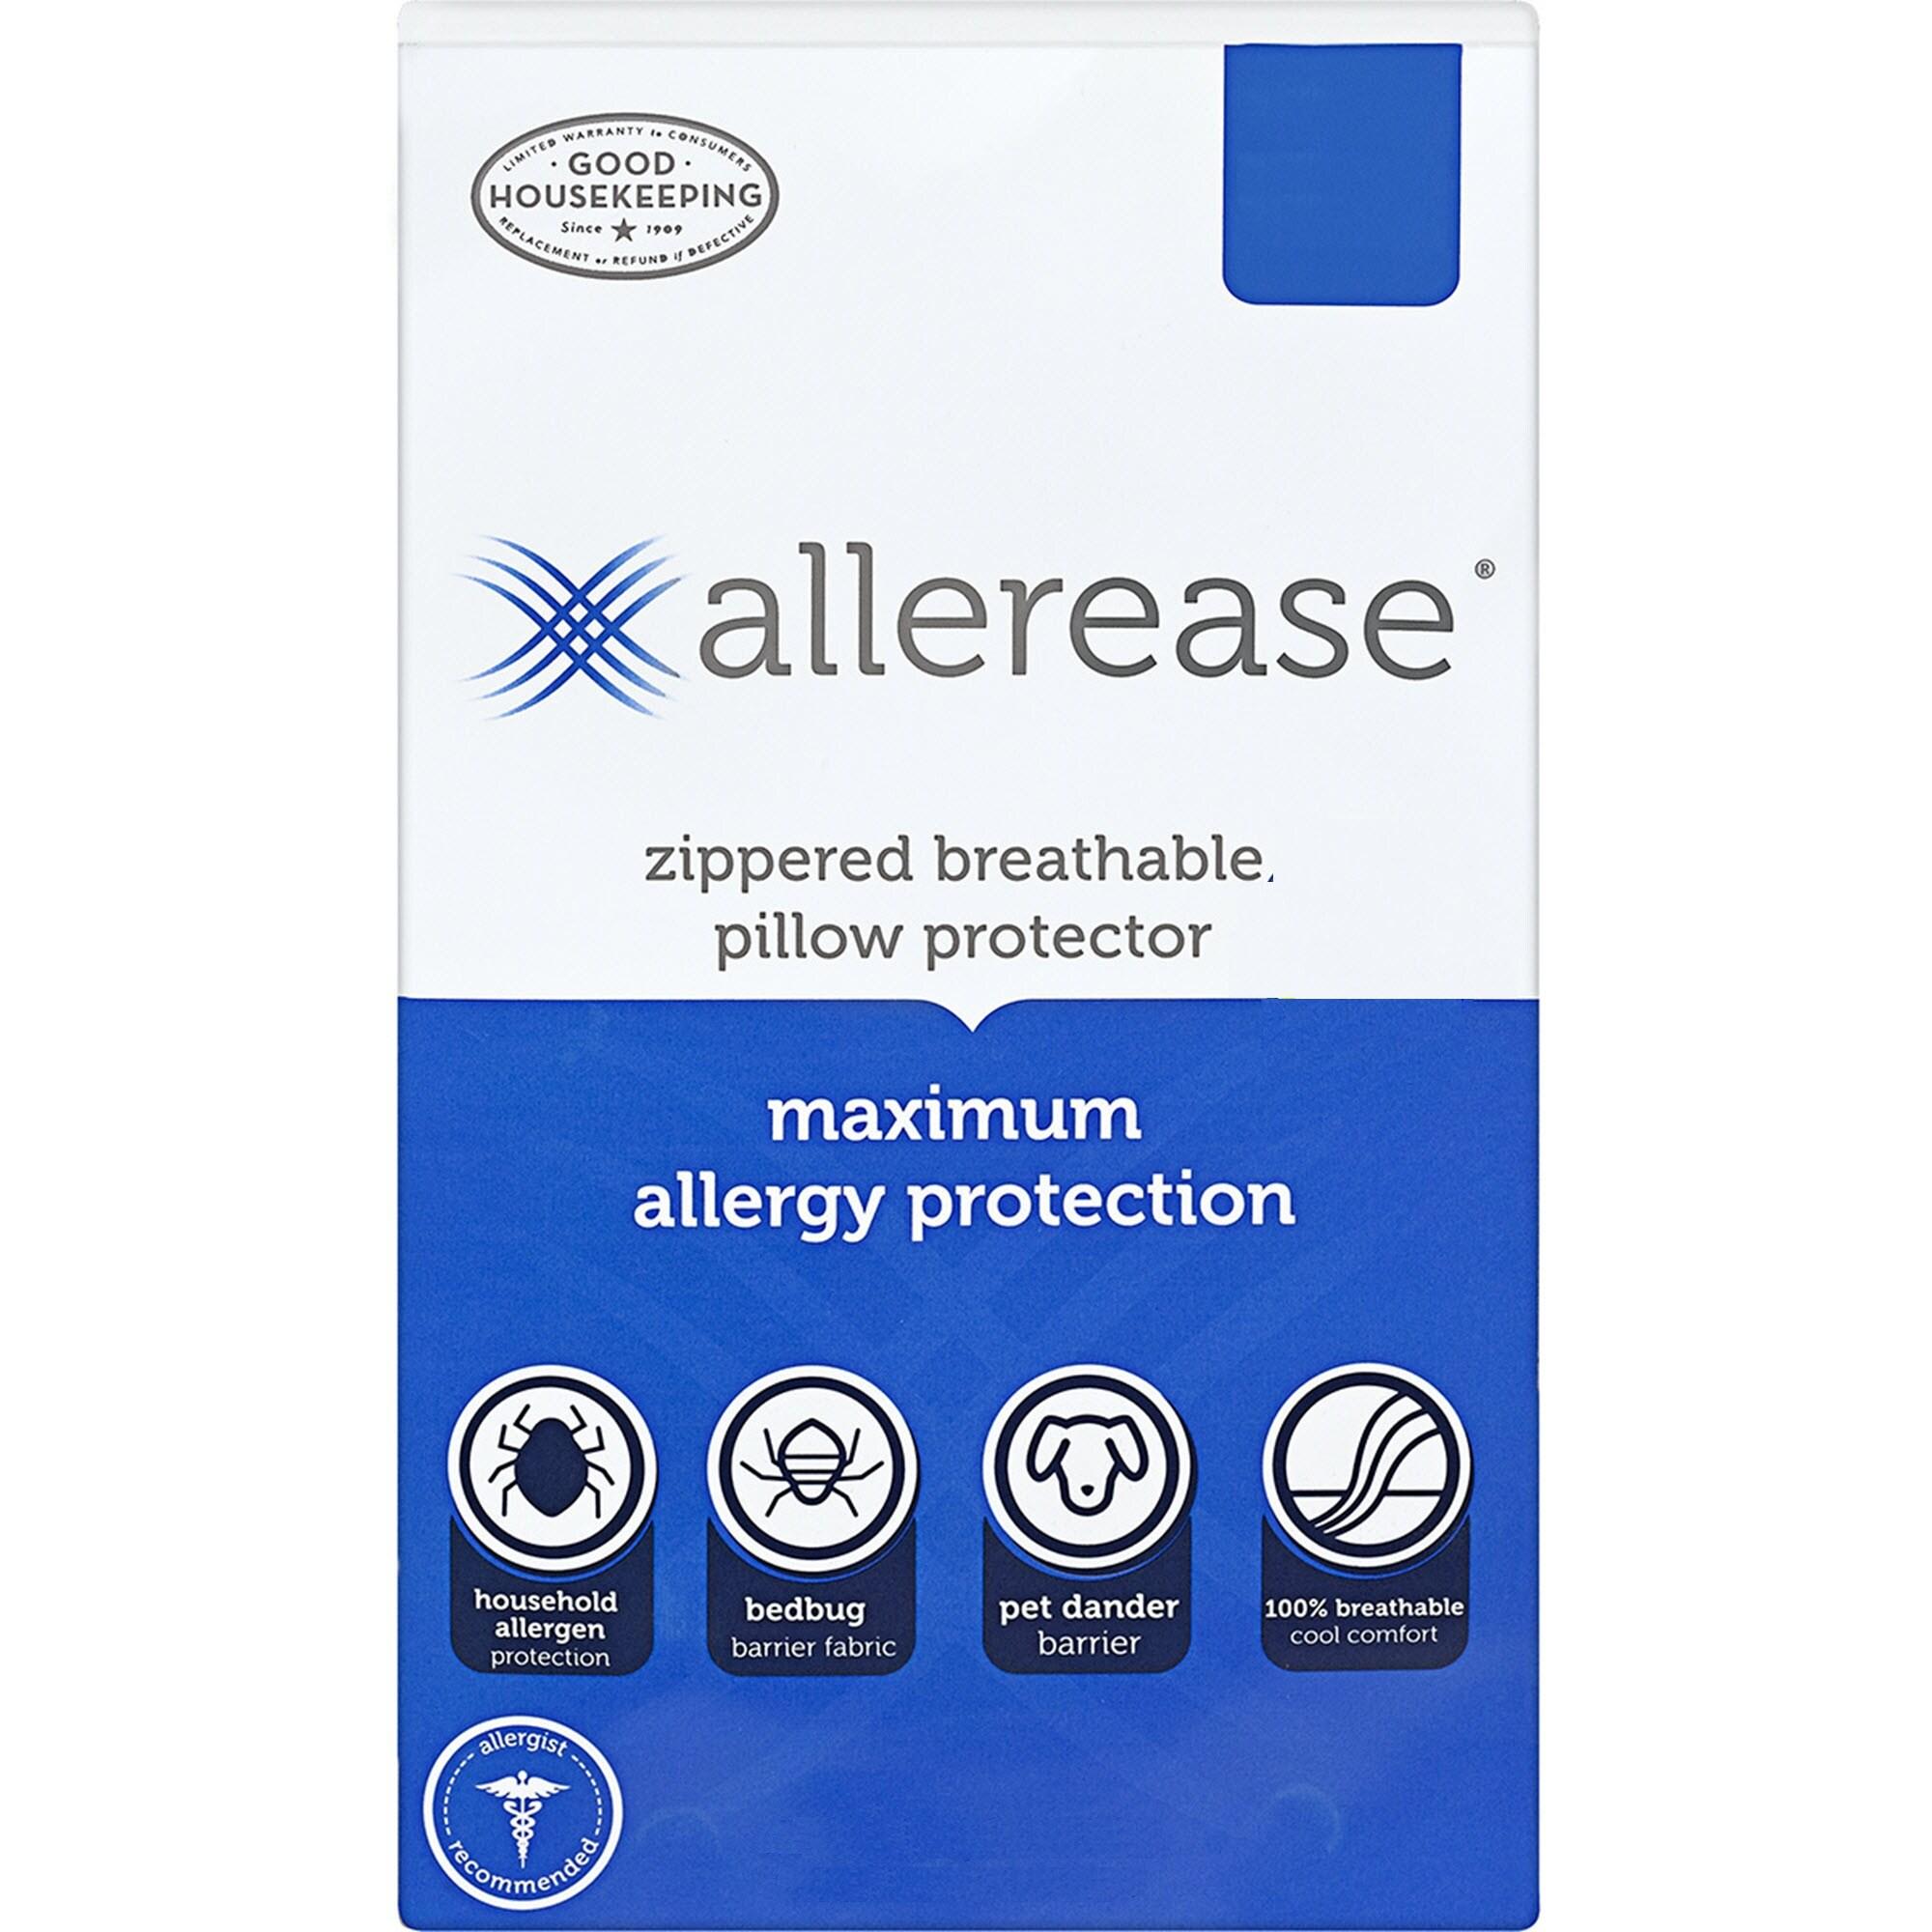 allerease maximum allergy bedbug zippered pillow protector